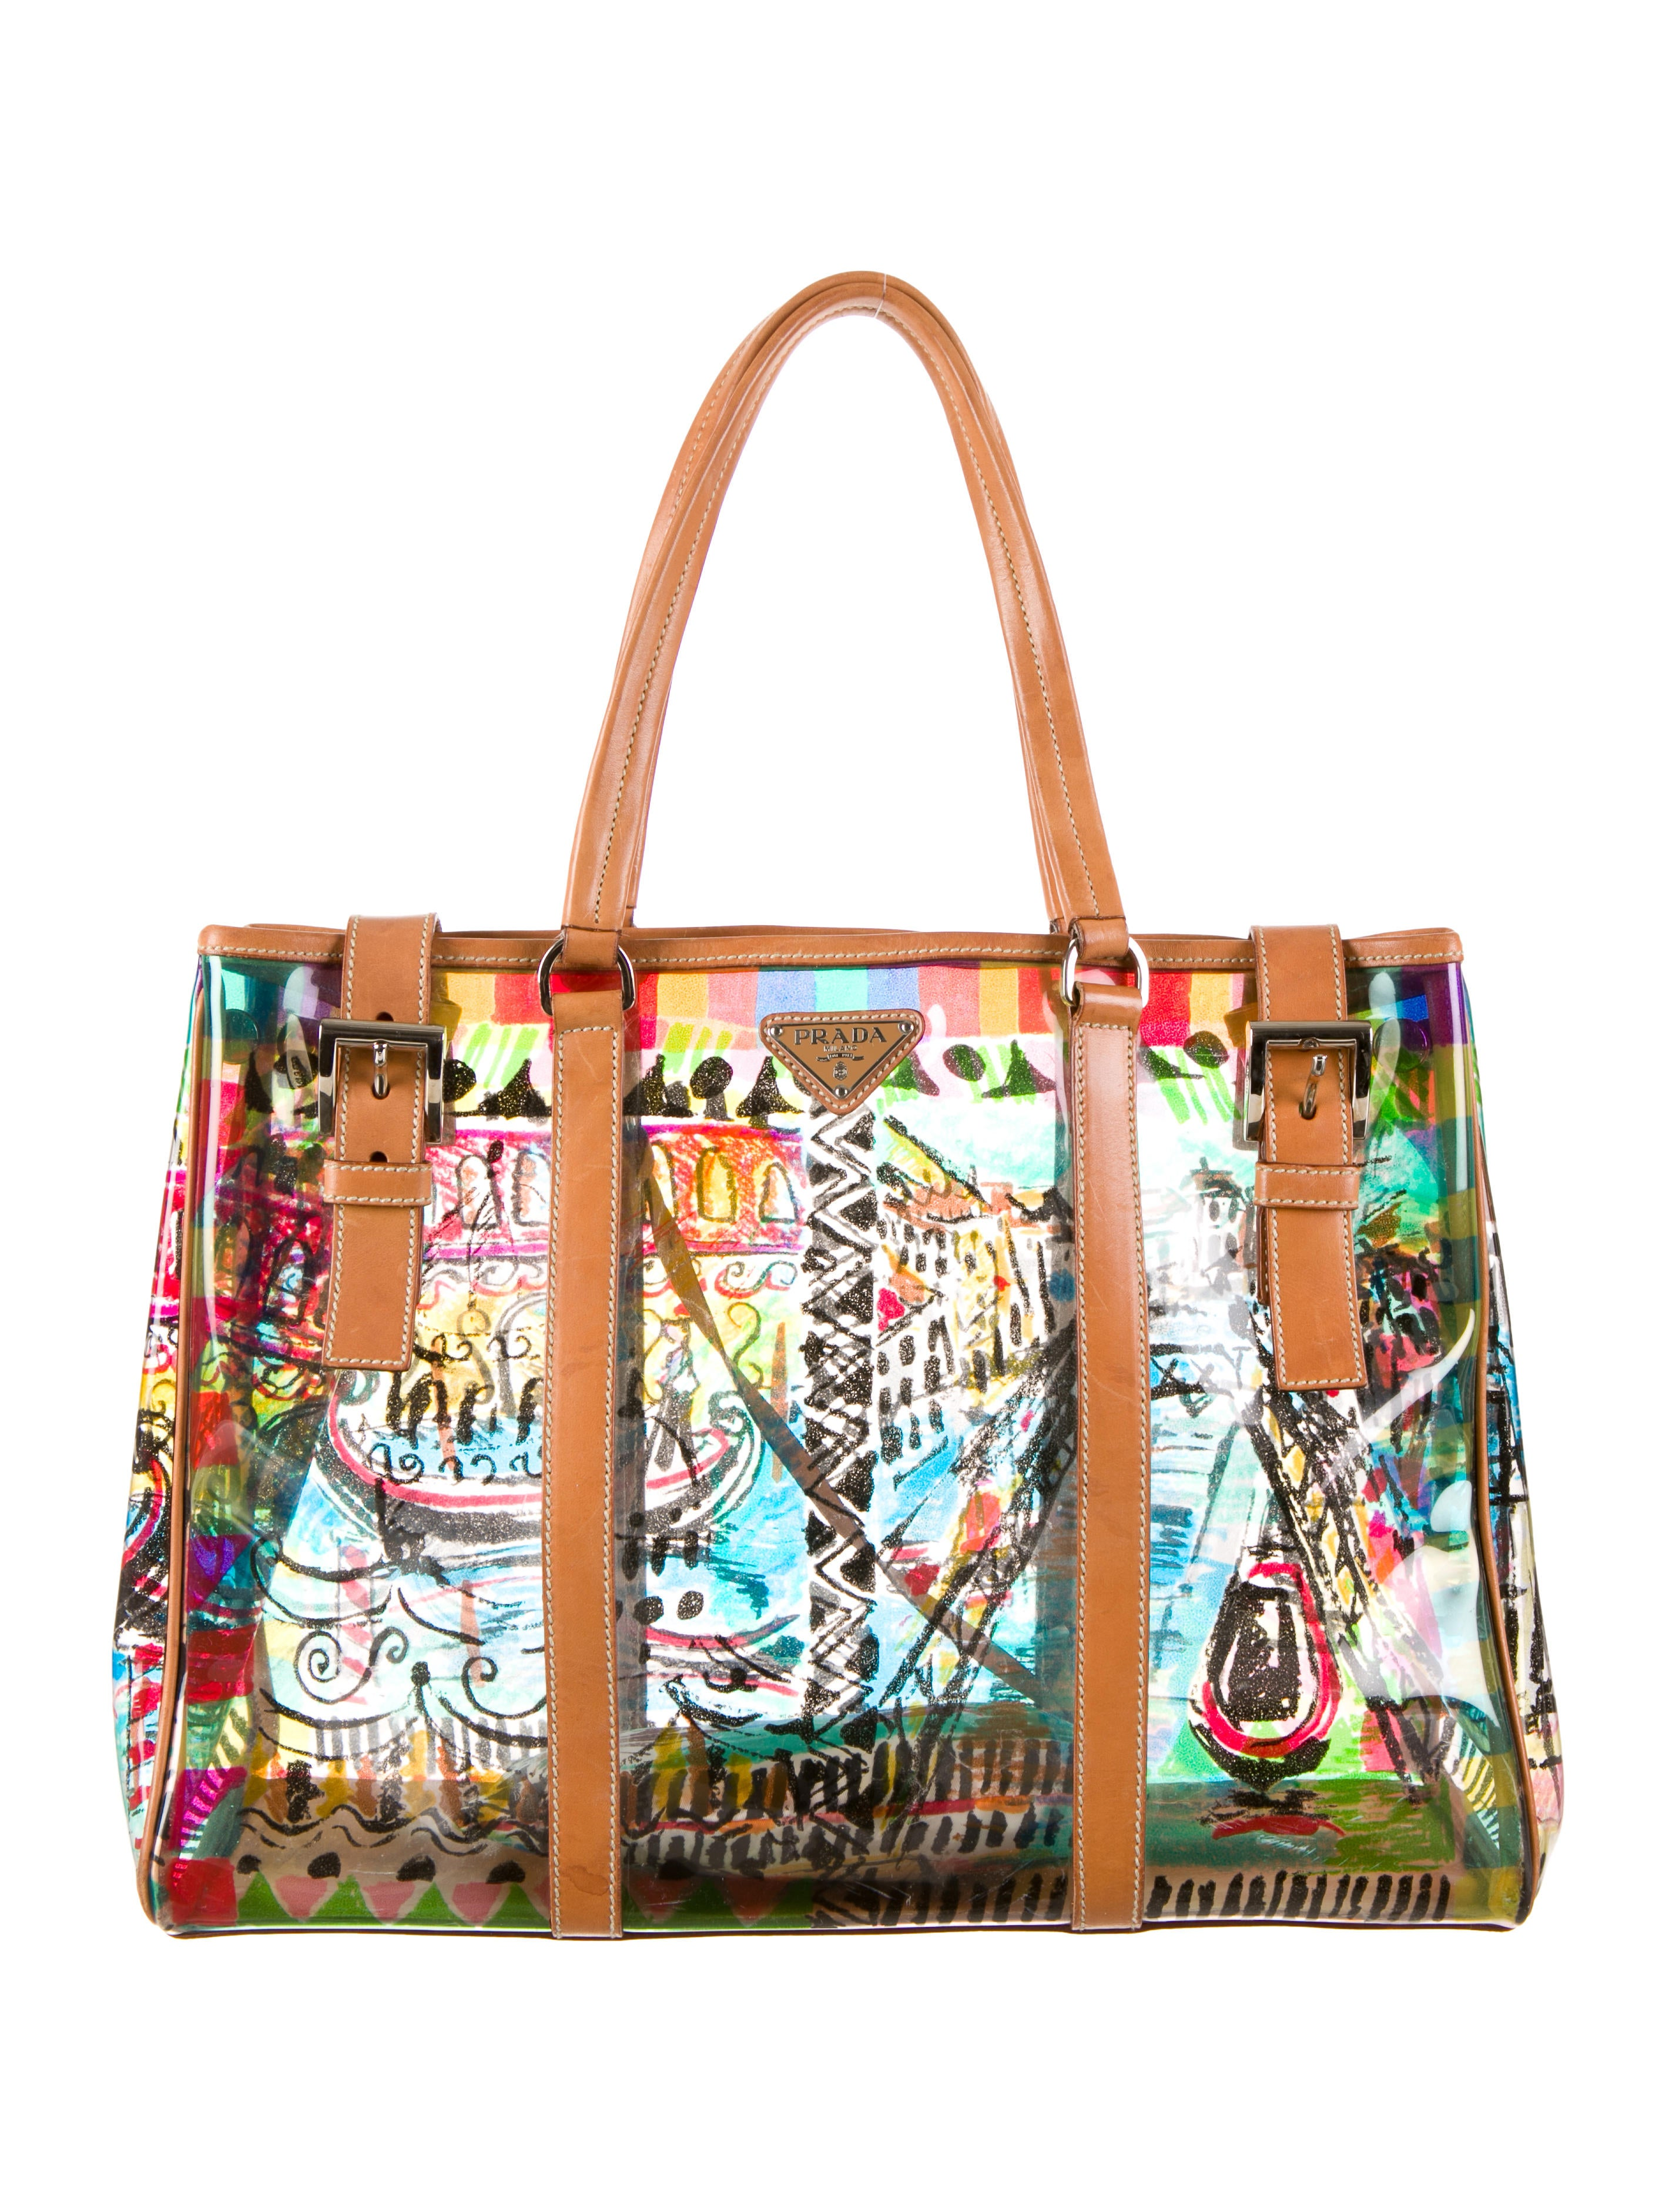 11d61ee22d29 Prada Vinyl Venice Tote - Handbags - PRA57550 | The RealReal